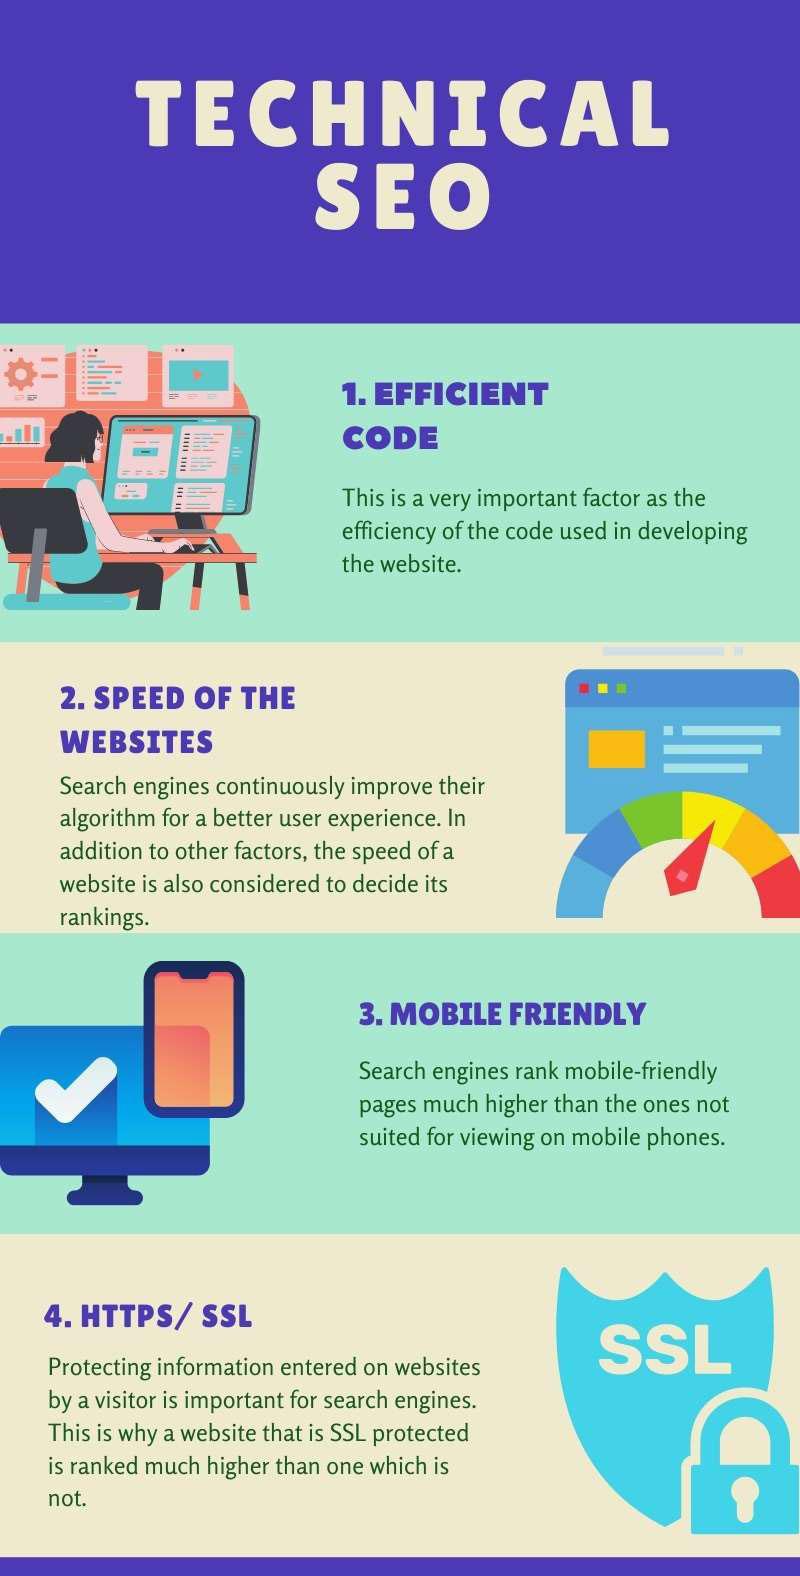 Technical SEO factors infographic